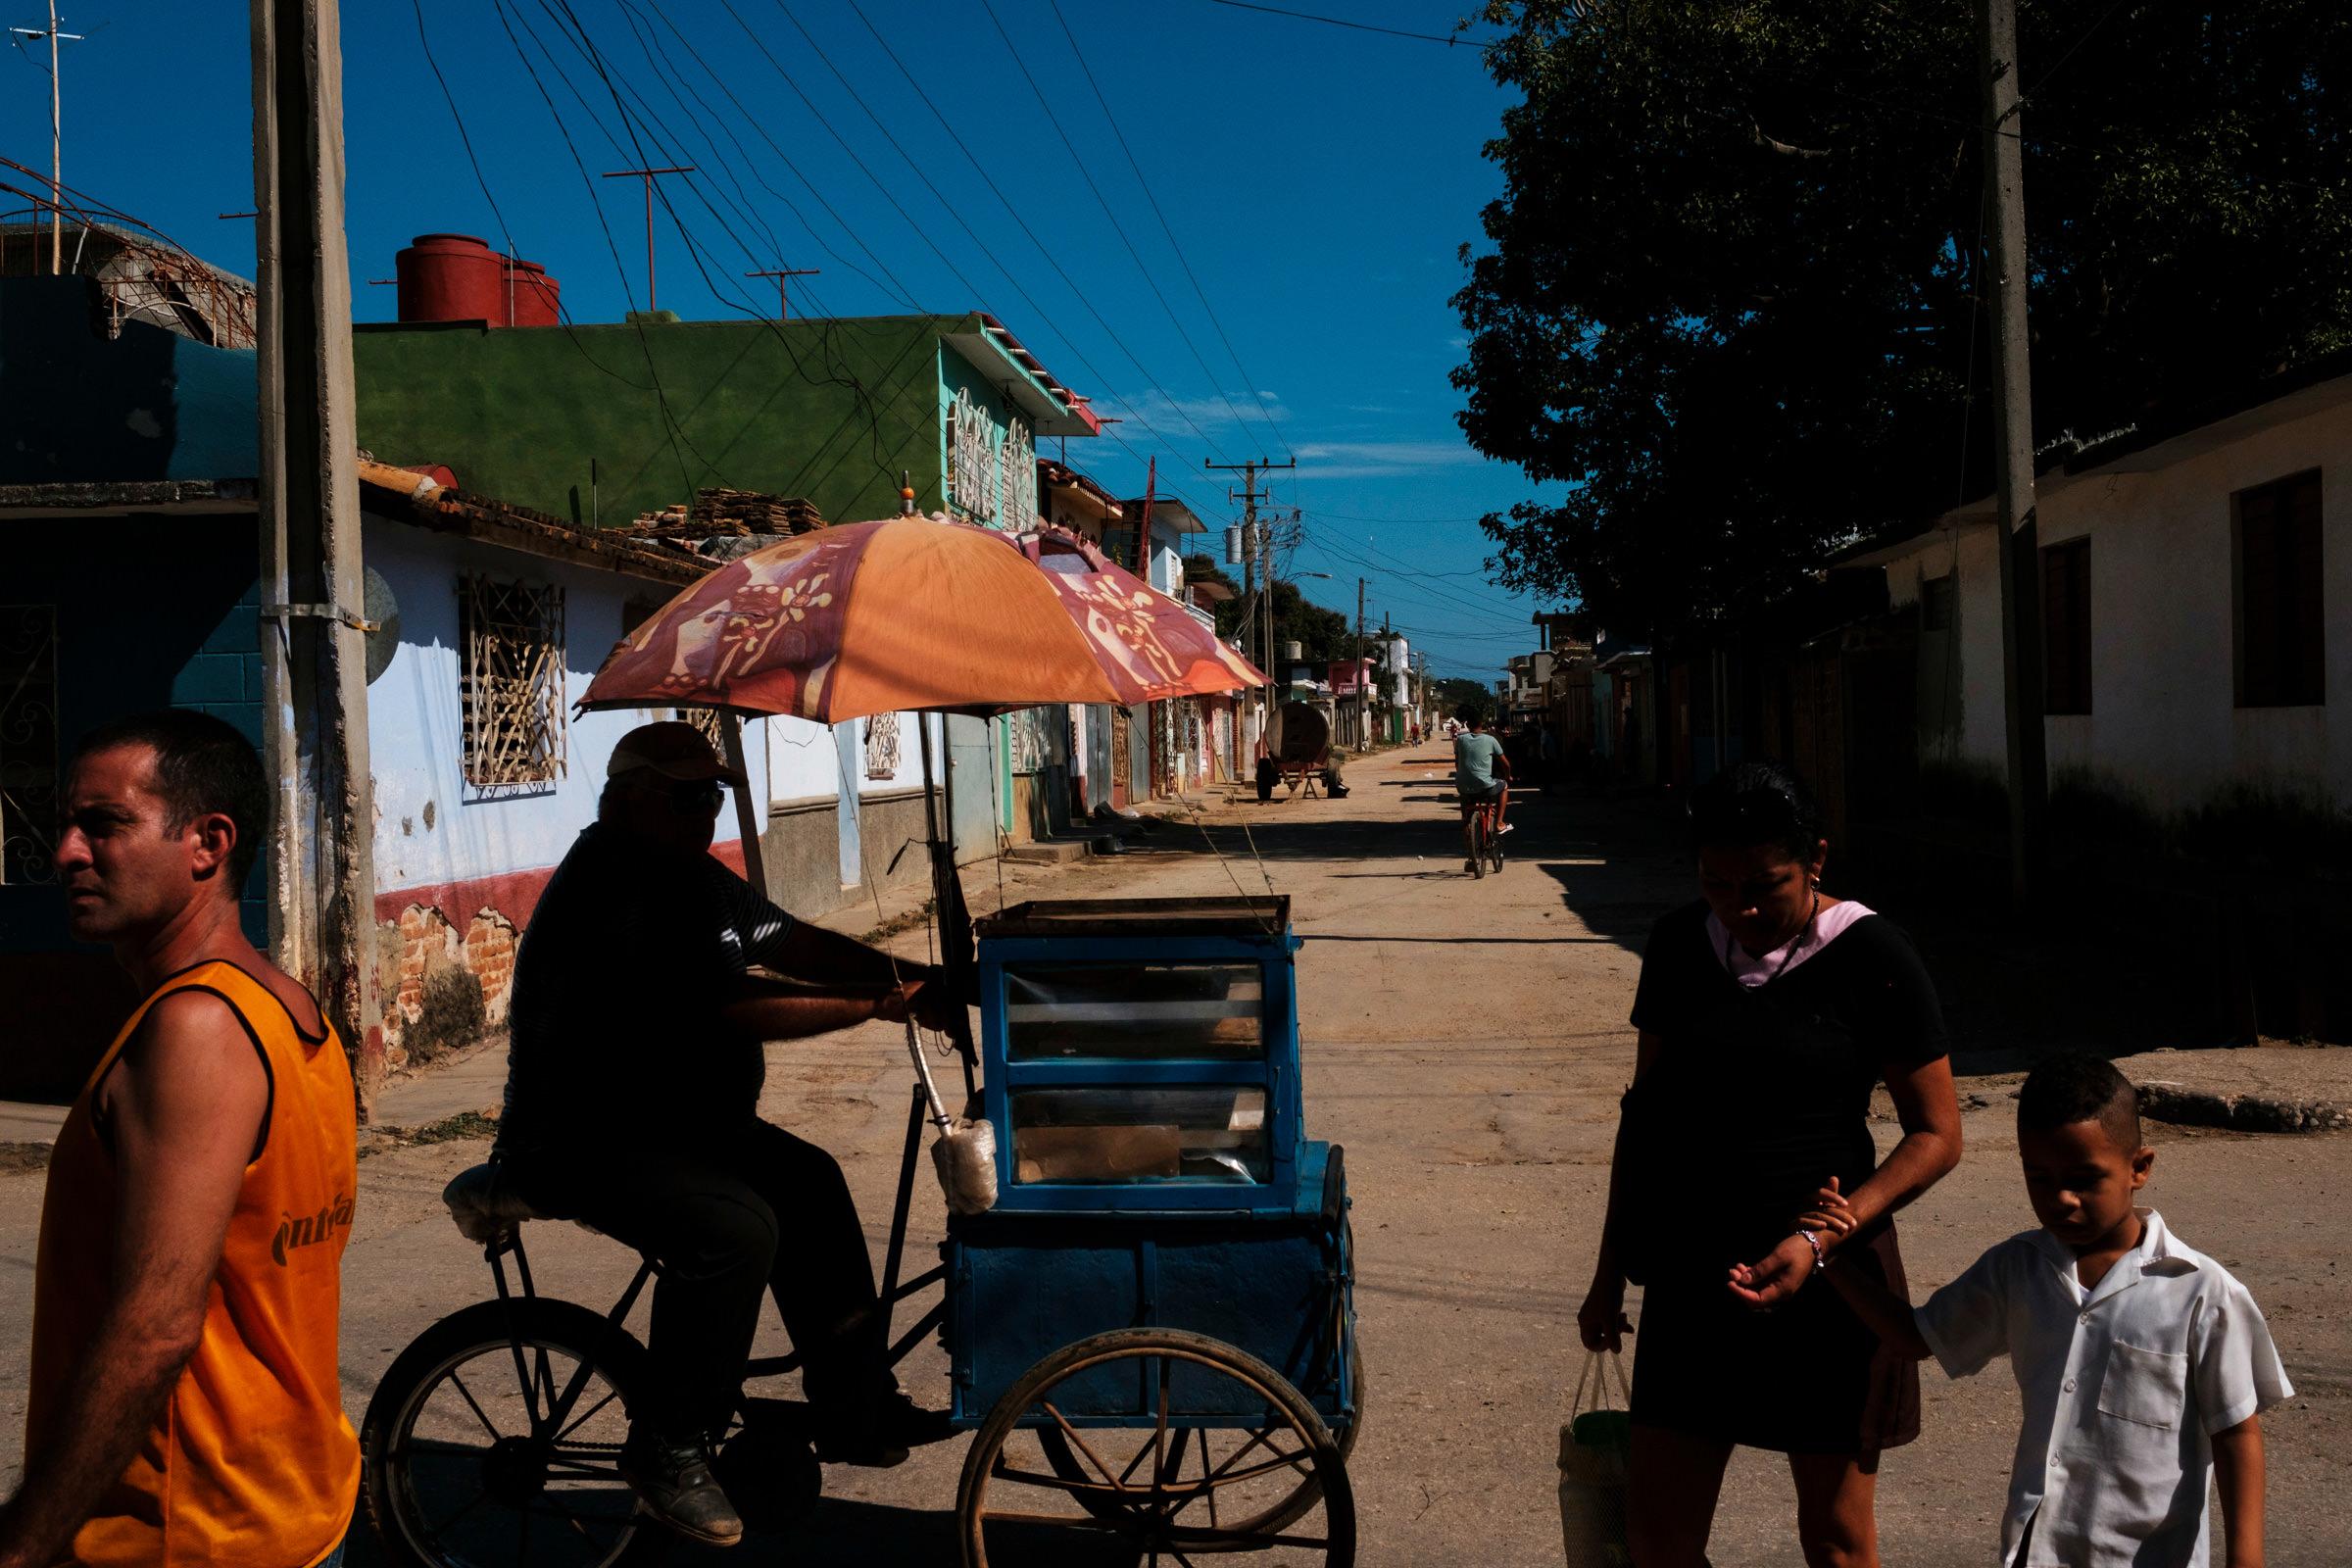 Cuba-Street-Photography-26